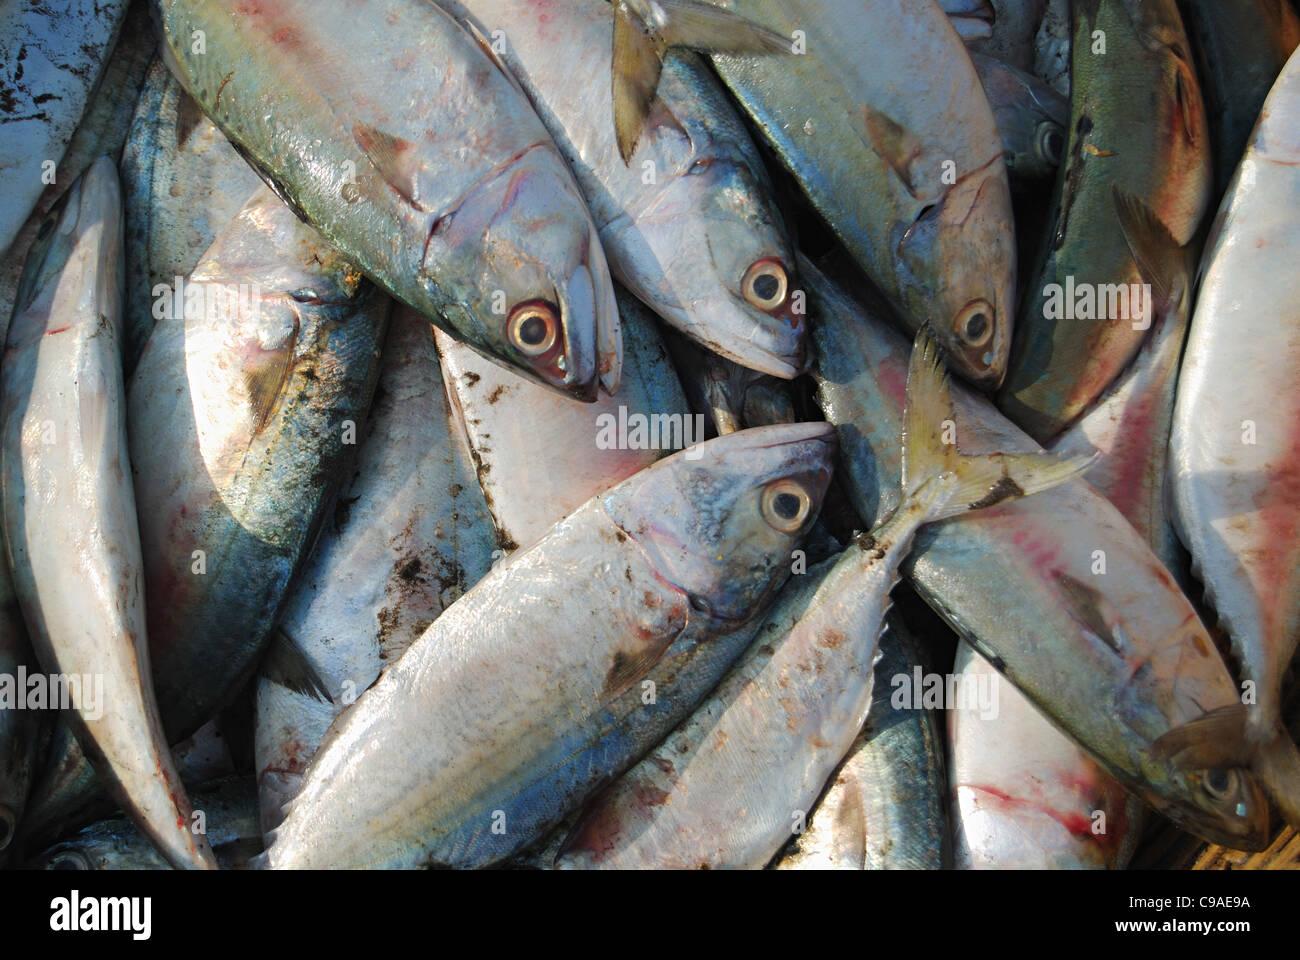 Indian mackerel rastrelliger kanagurta or banagda on for Kumak s fish